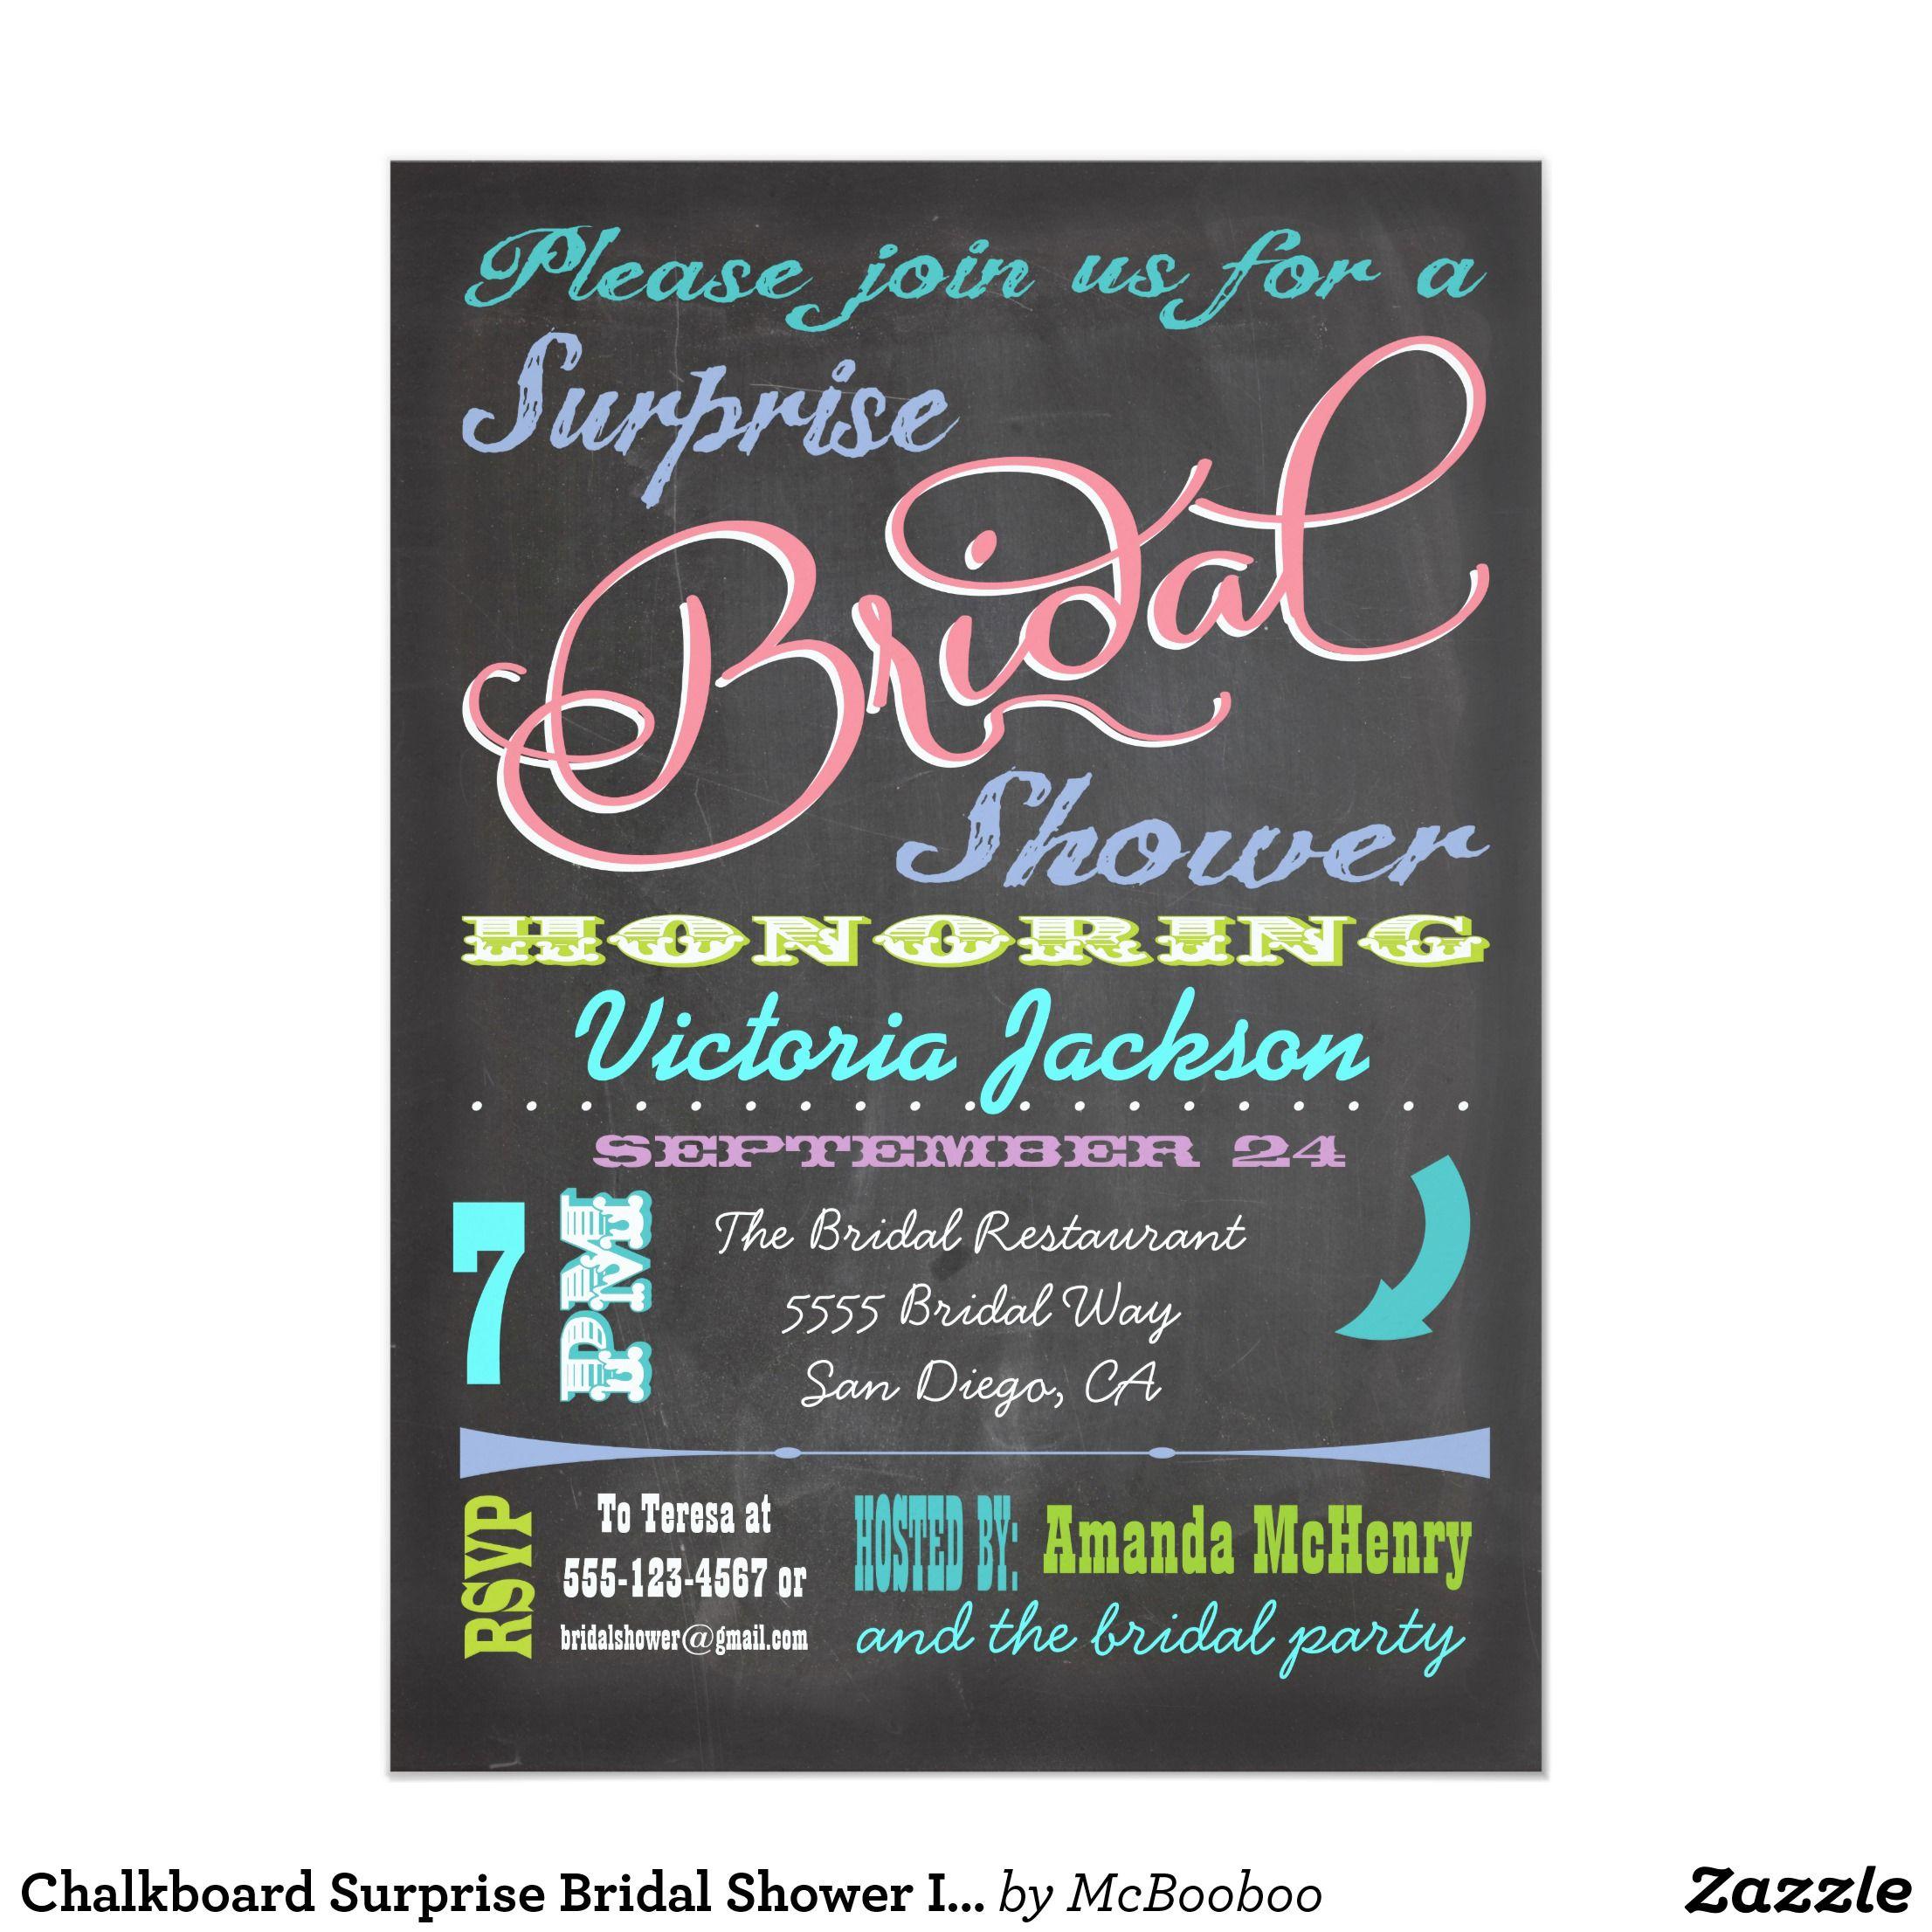 chalkboard surprise bridal shower invitations